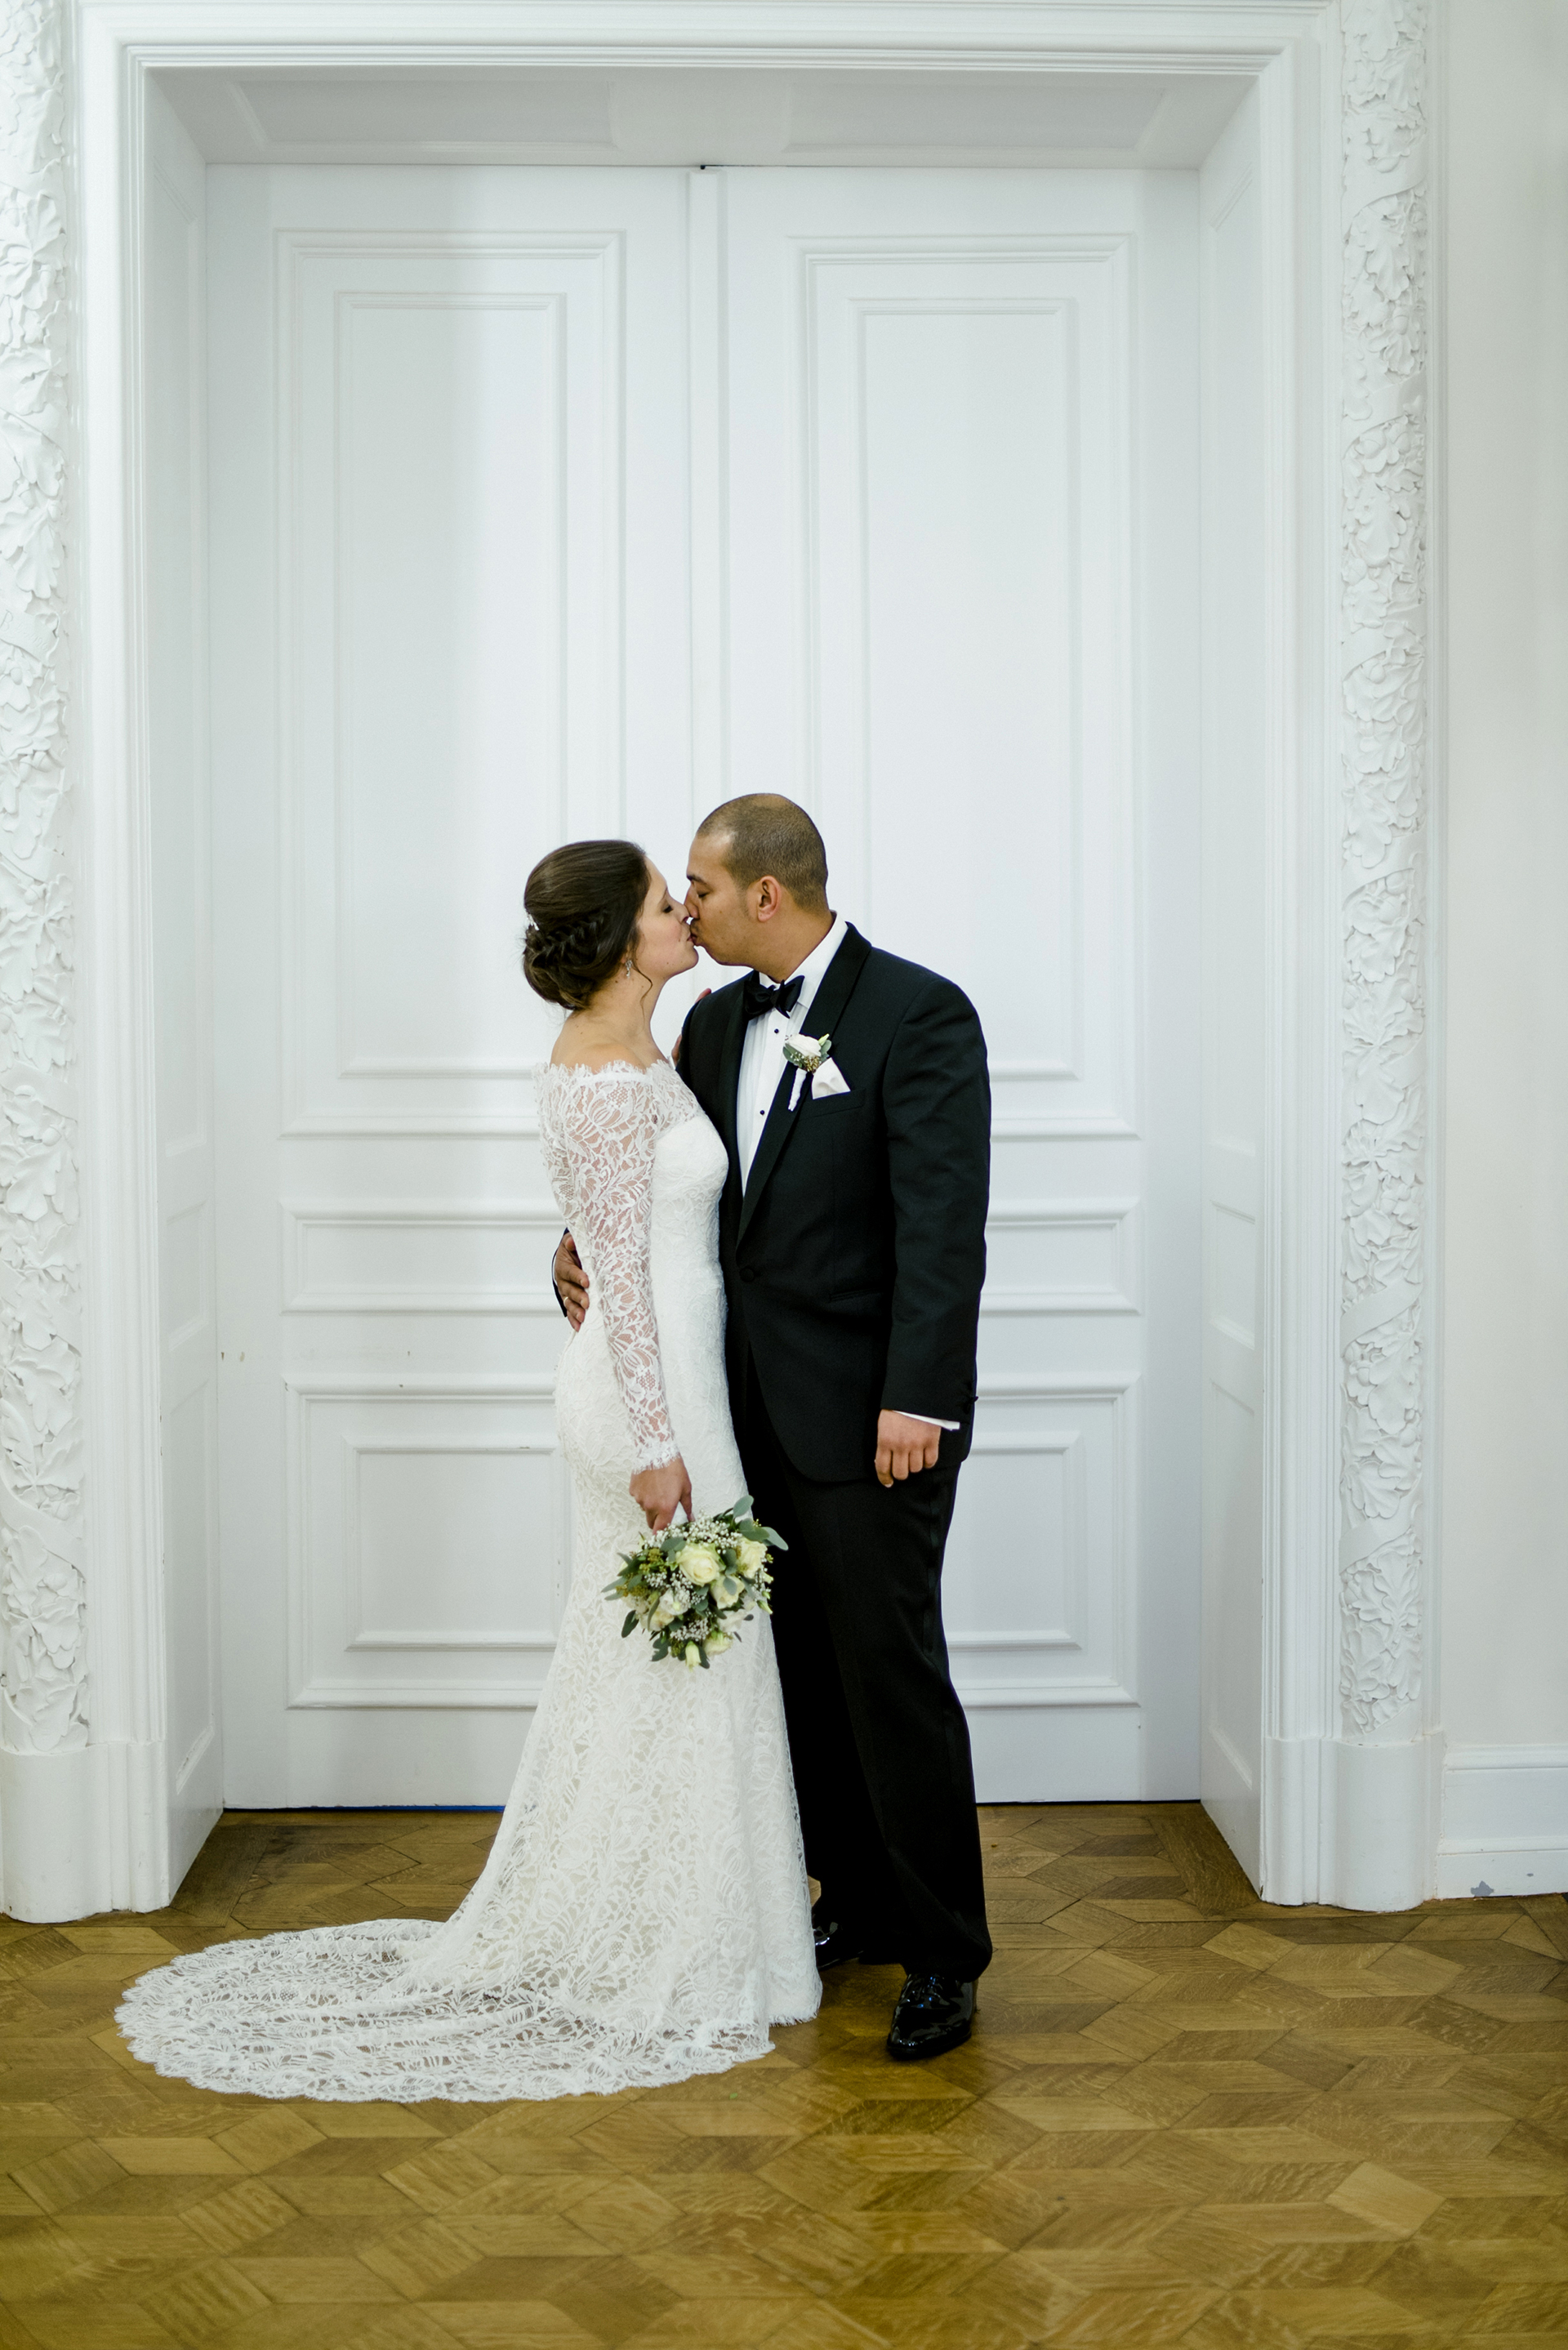 Hochzeitsreportage_J&D_049_Caroline Queda Fotografie